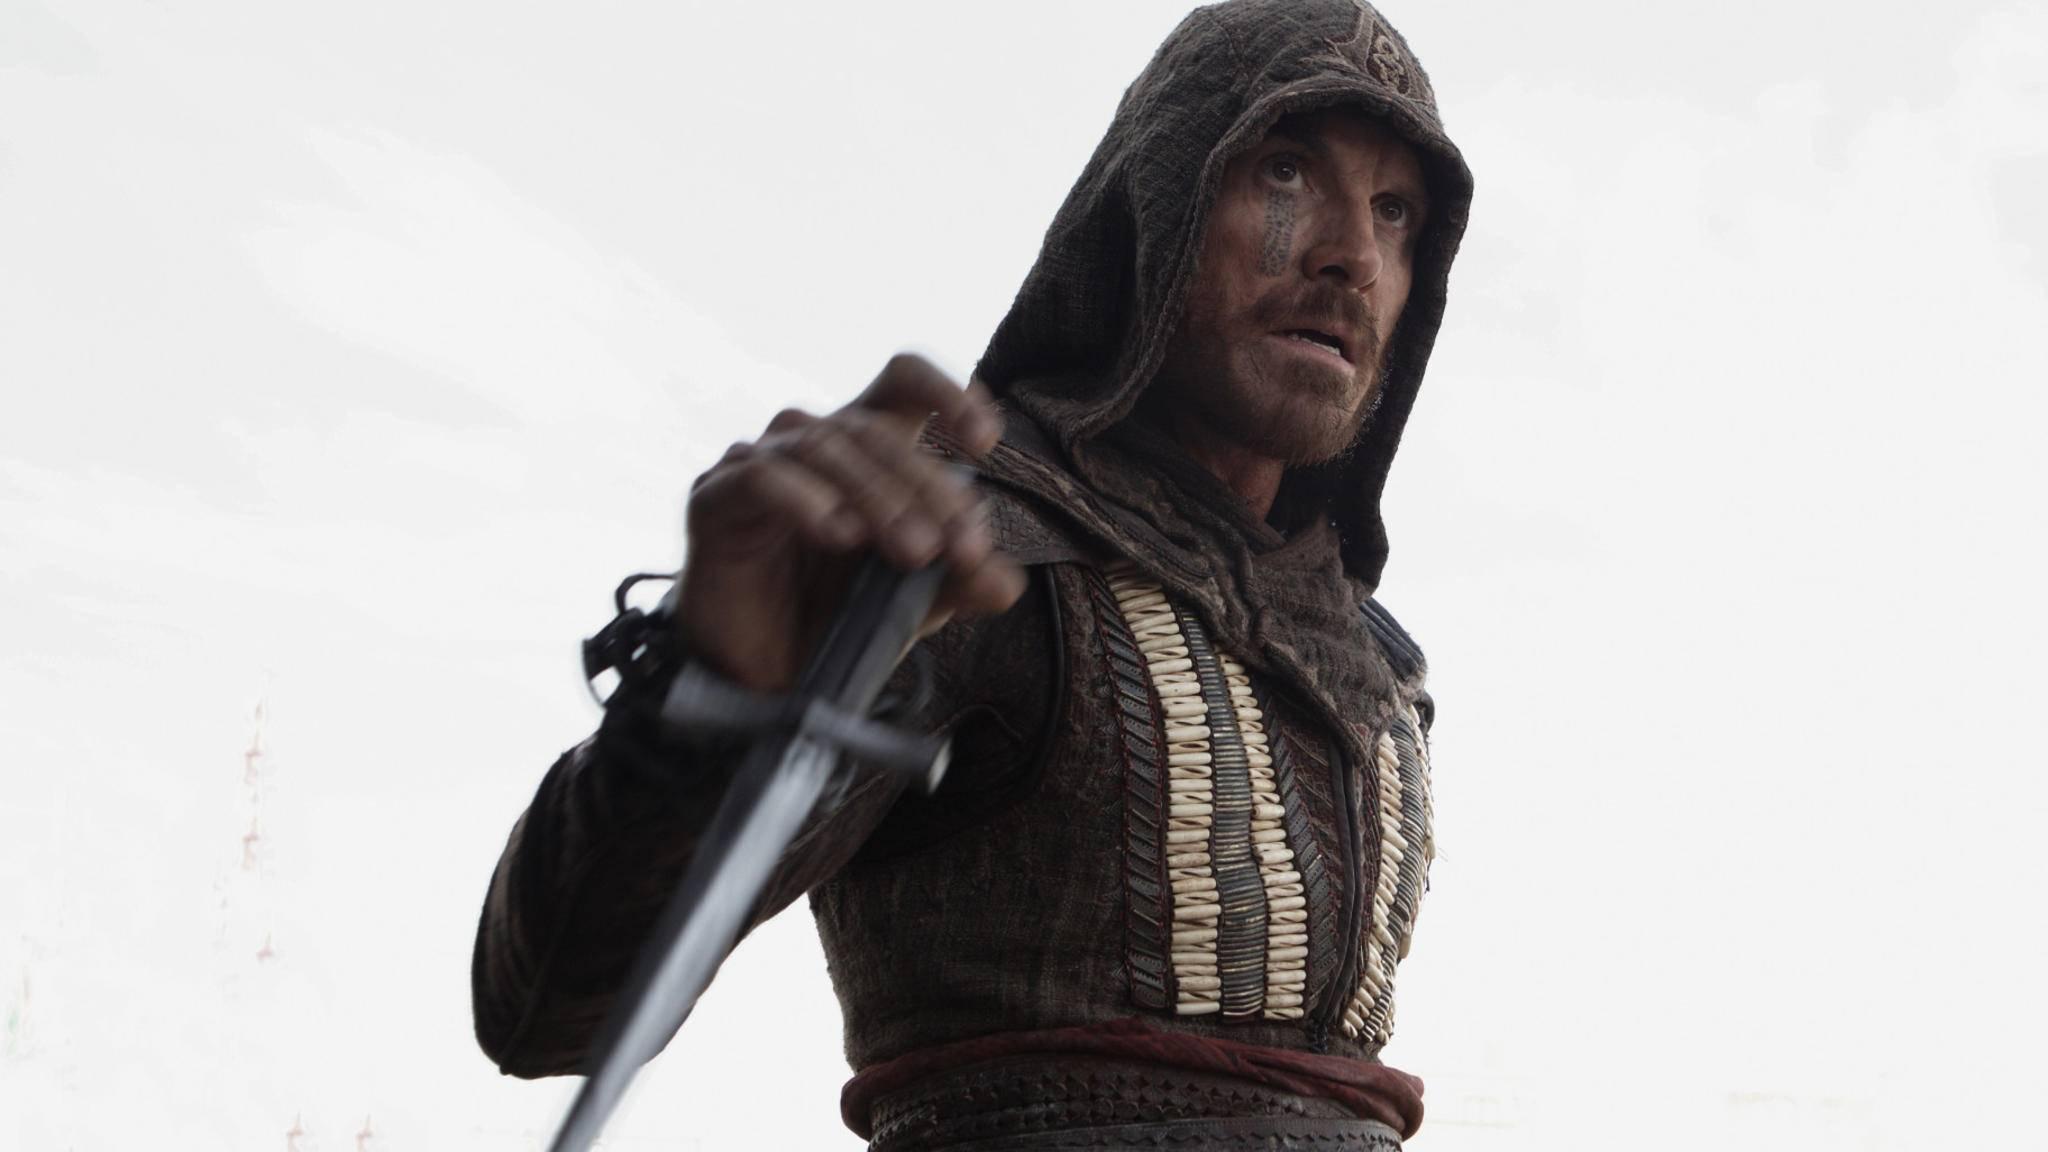 "Michael Fassbender brachte ""Assassin's Creed"" 2016 auf die große Leinwand. Verkörpert er auch im TV einen Assassinen?"